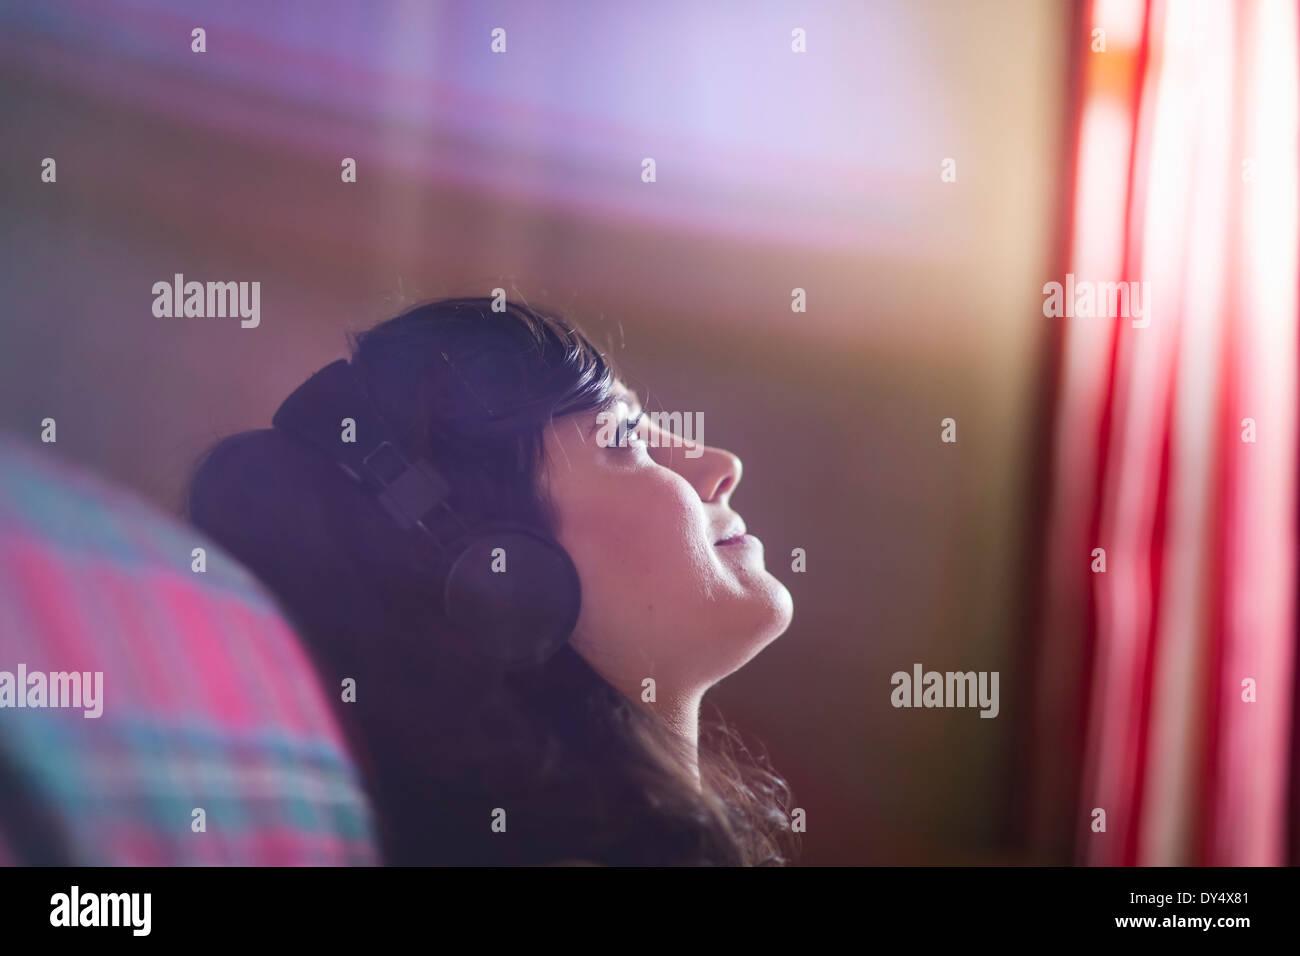 Junge Frau mit Kopfhörern, Tagträumen Stockbild